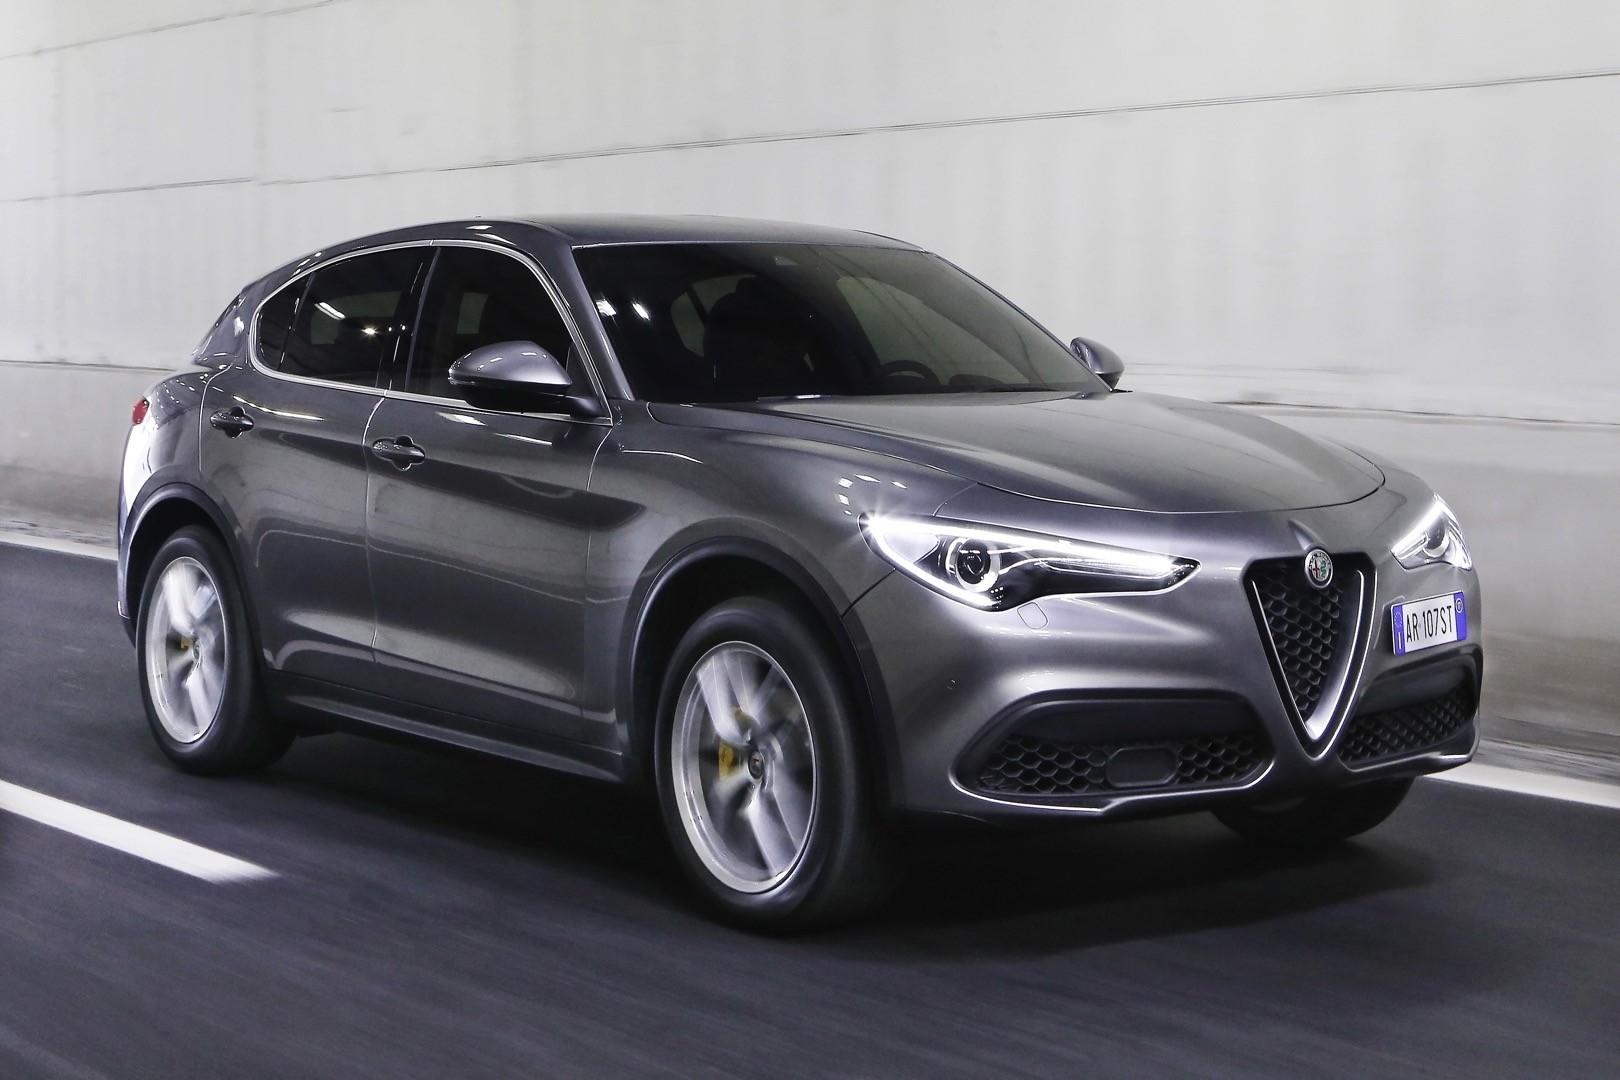 New Maserati Suv Coming By With Alfa Romeo Underpinnings